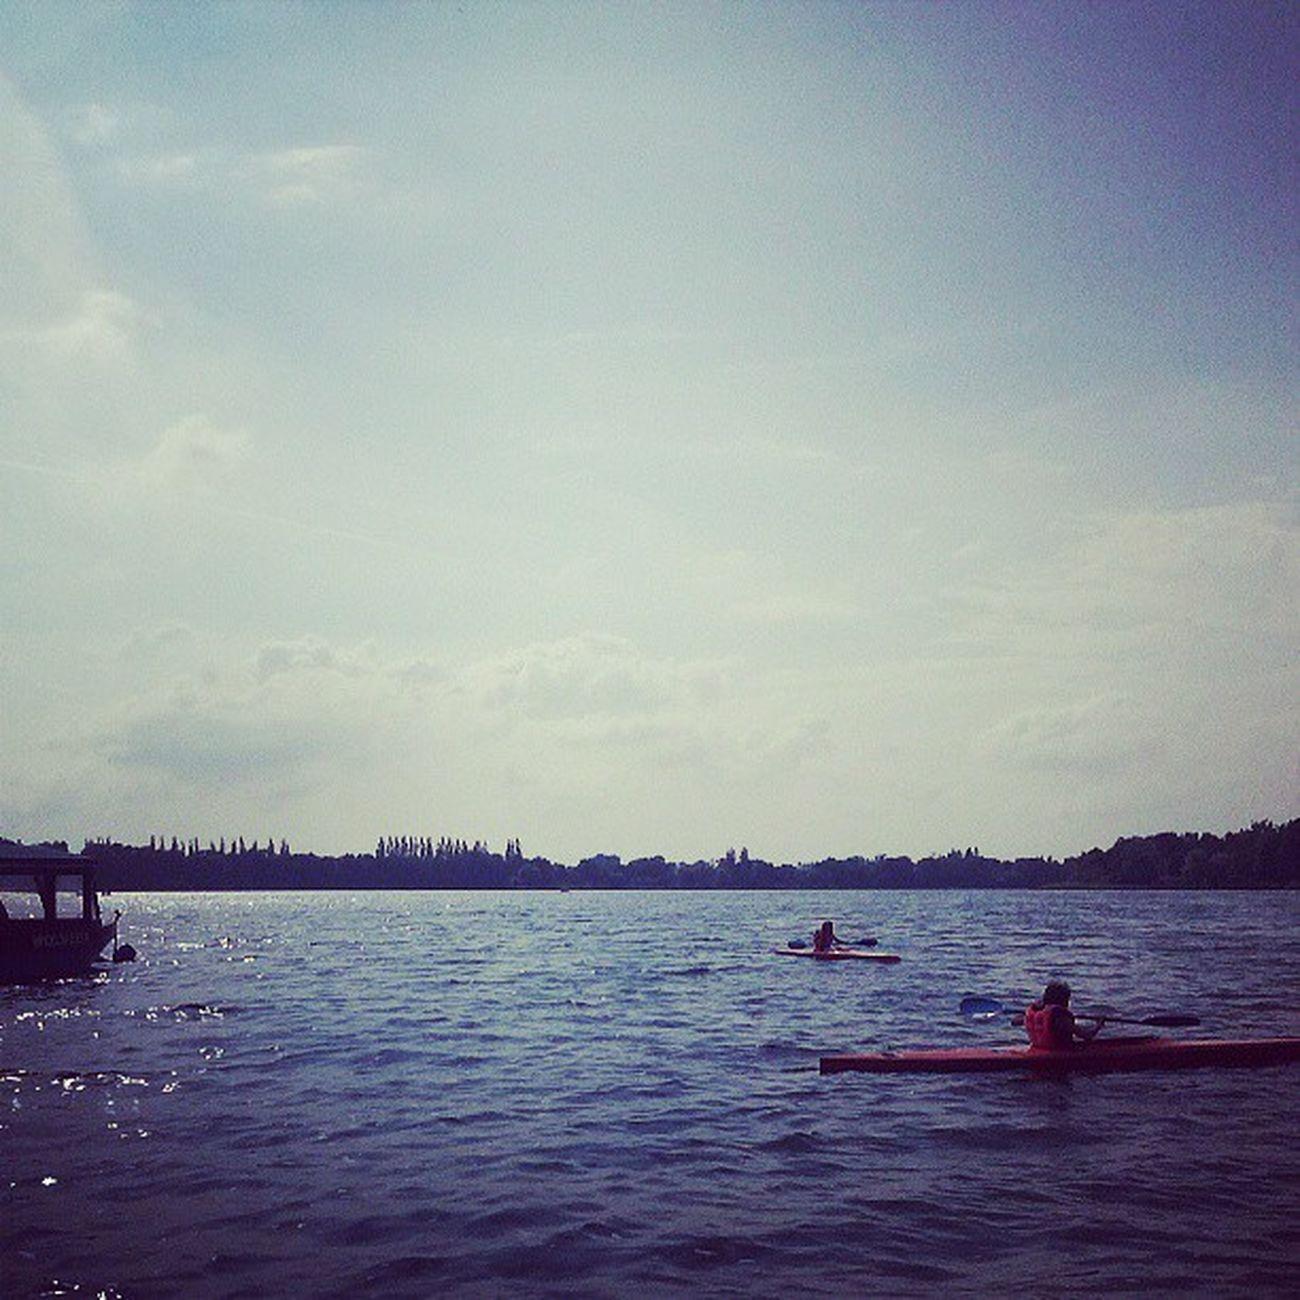 Lake Sunny☀ People Choszczno